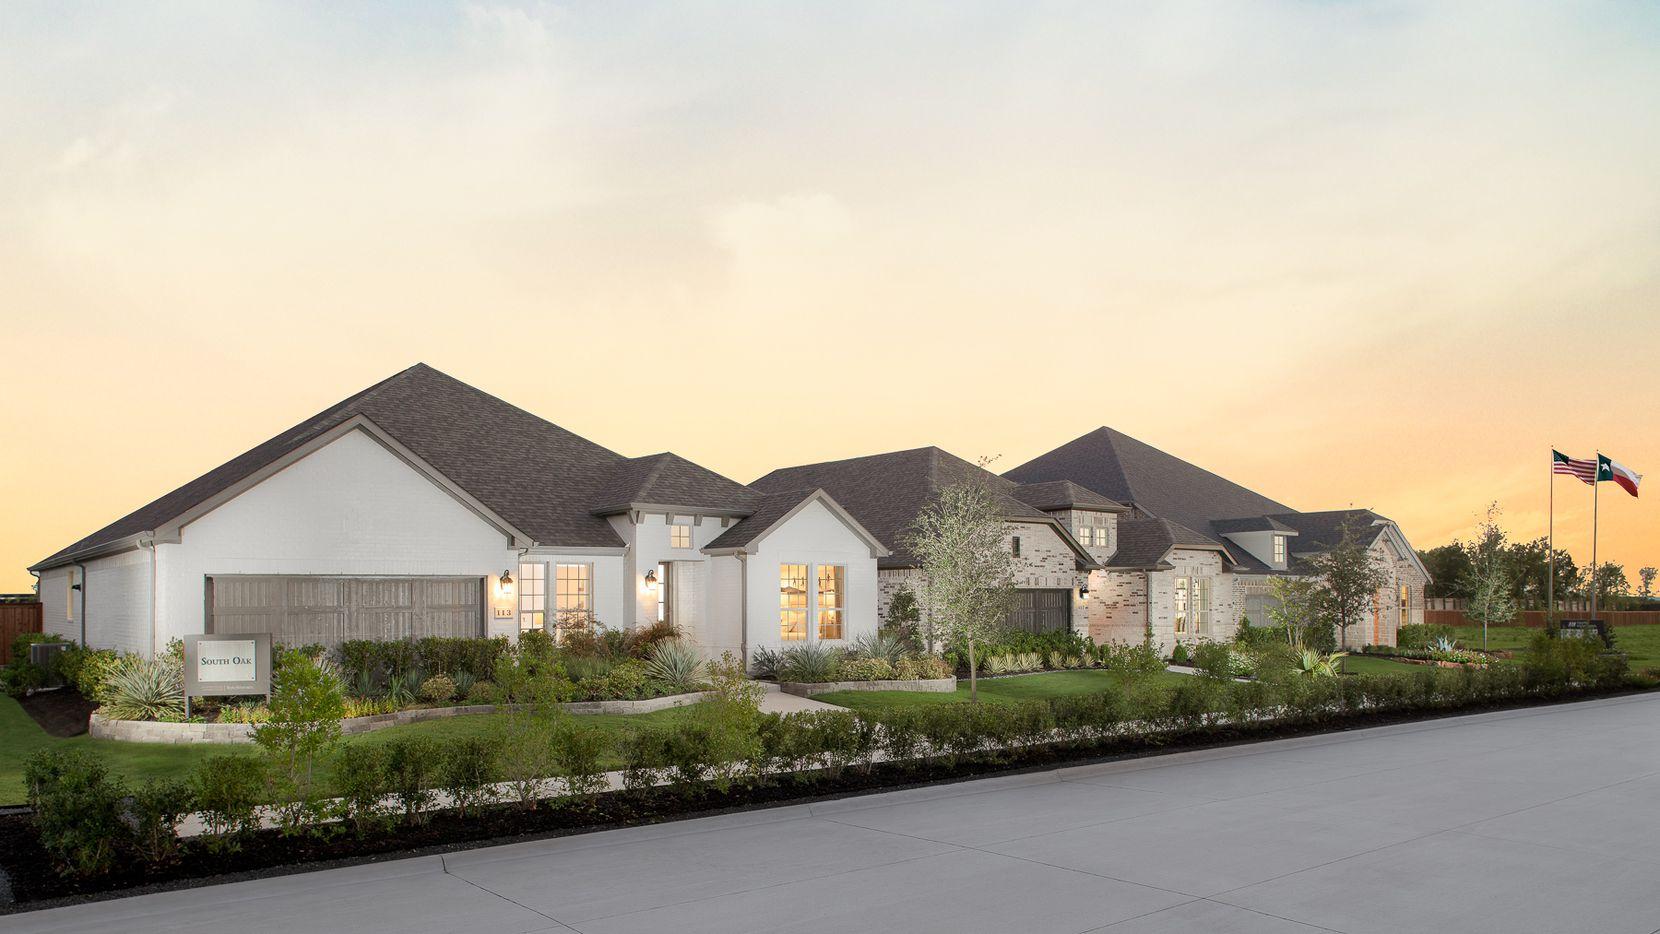 Taylor Morrison's new South Oak community has more than 230 single-family homes.